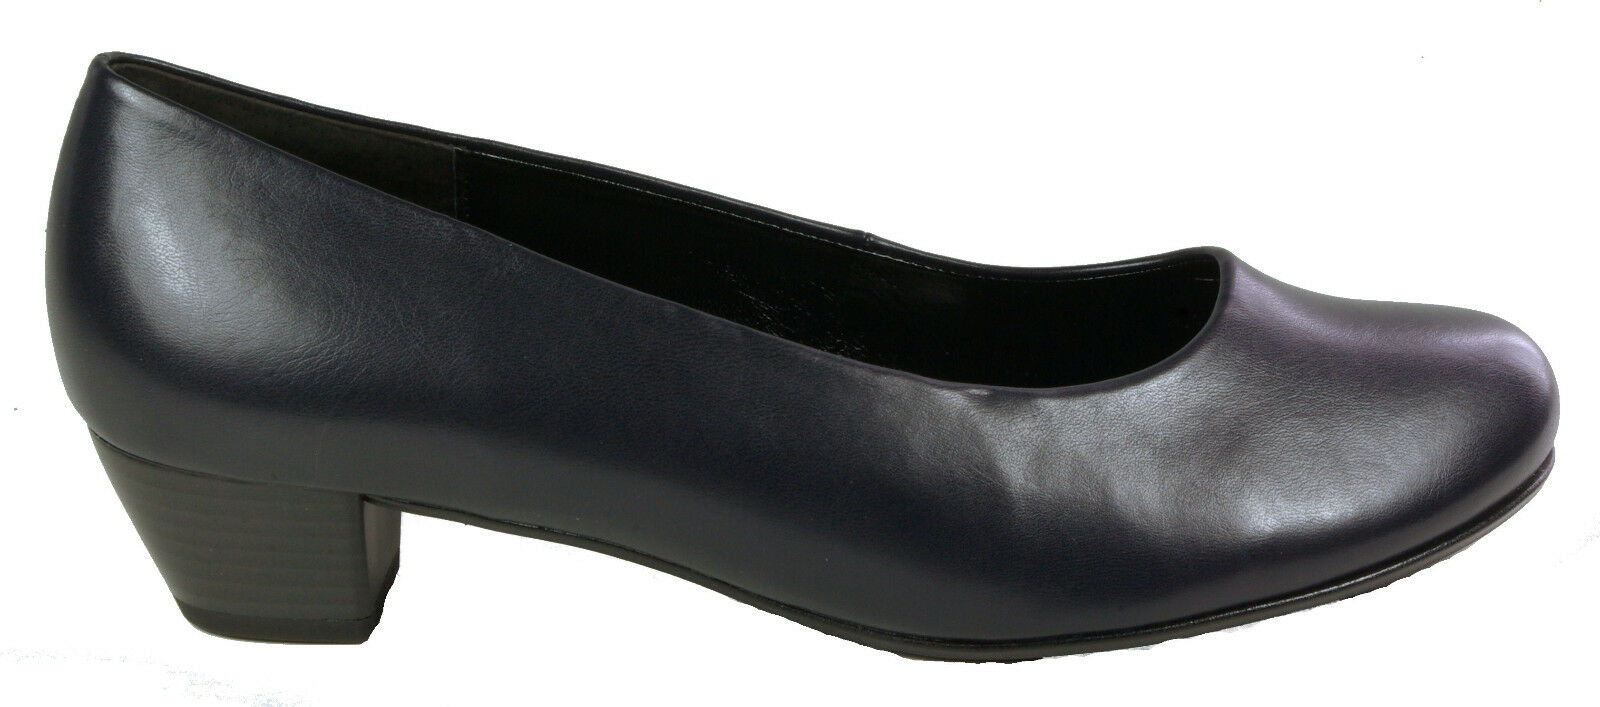 GABOR GABOR GABOR Schuhe Pumps Dunkelblau (OCEAN) H-Weite NEU 278621